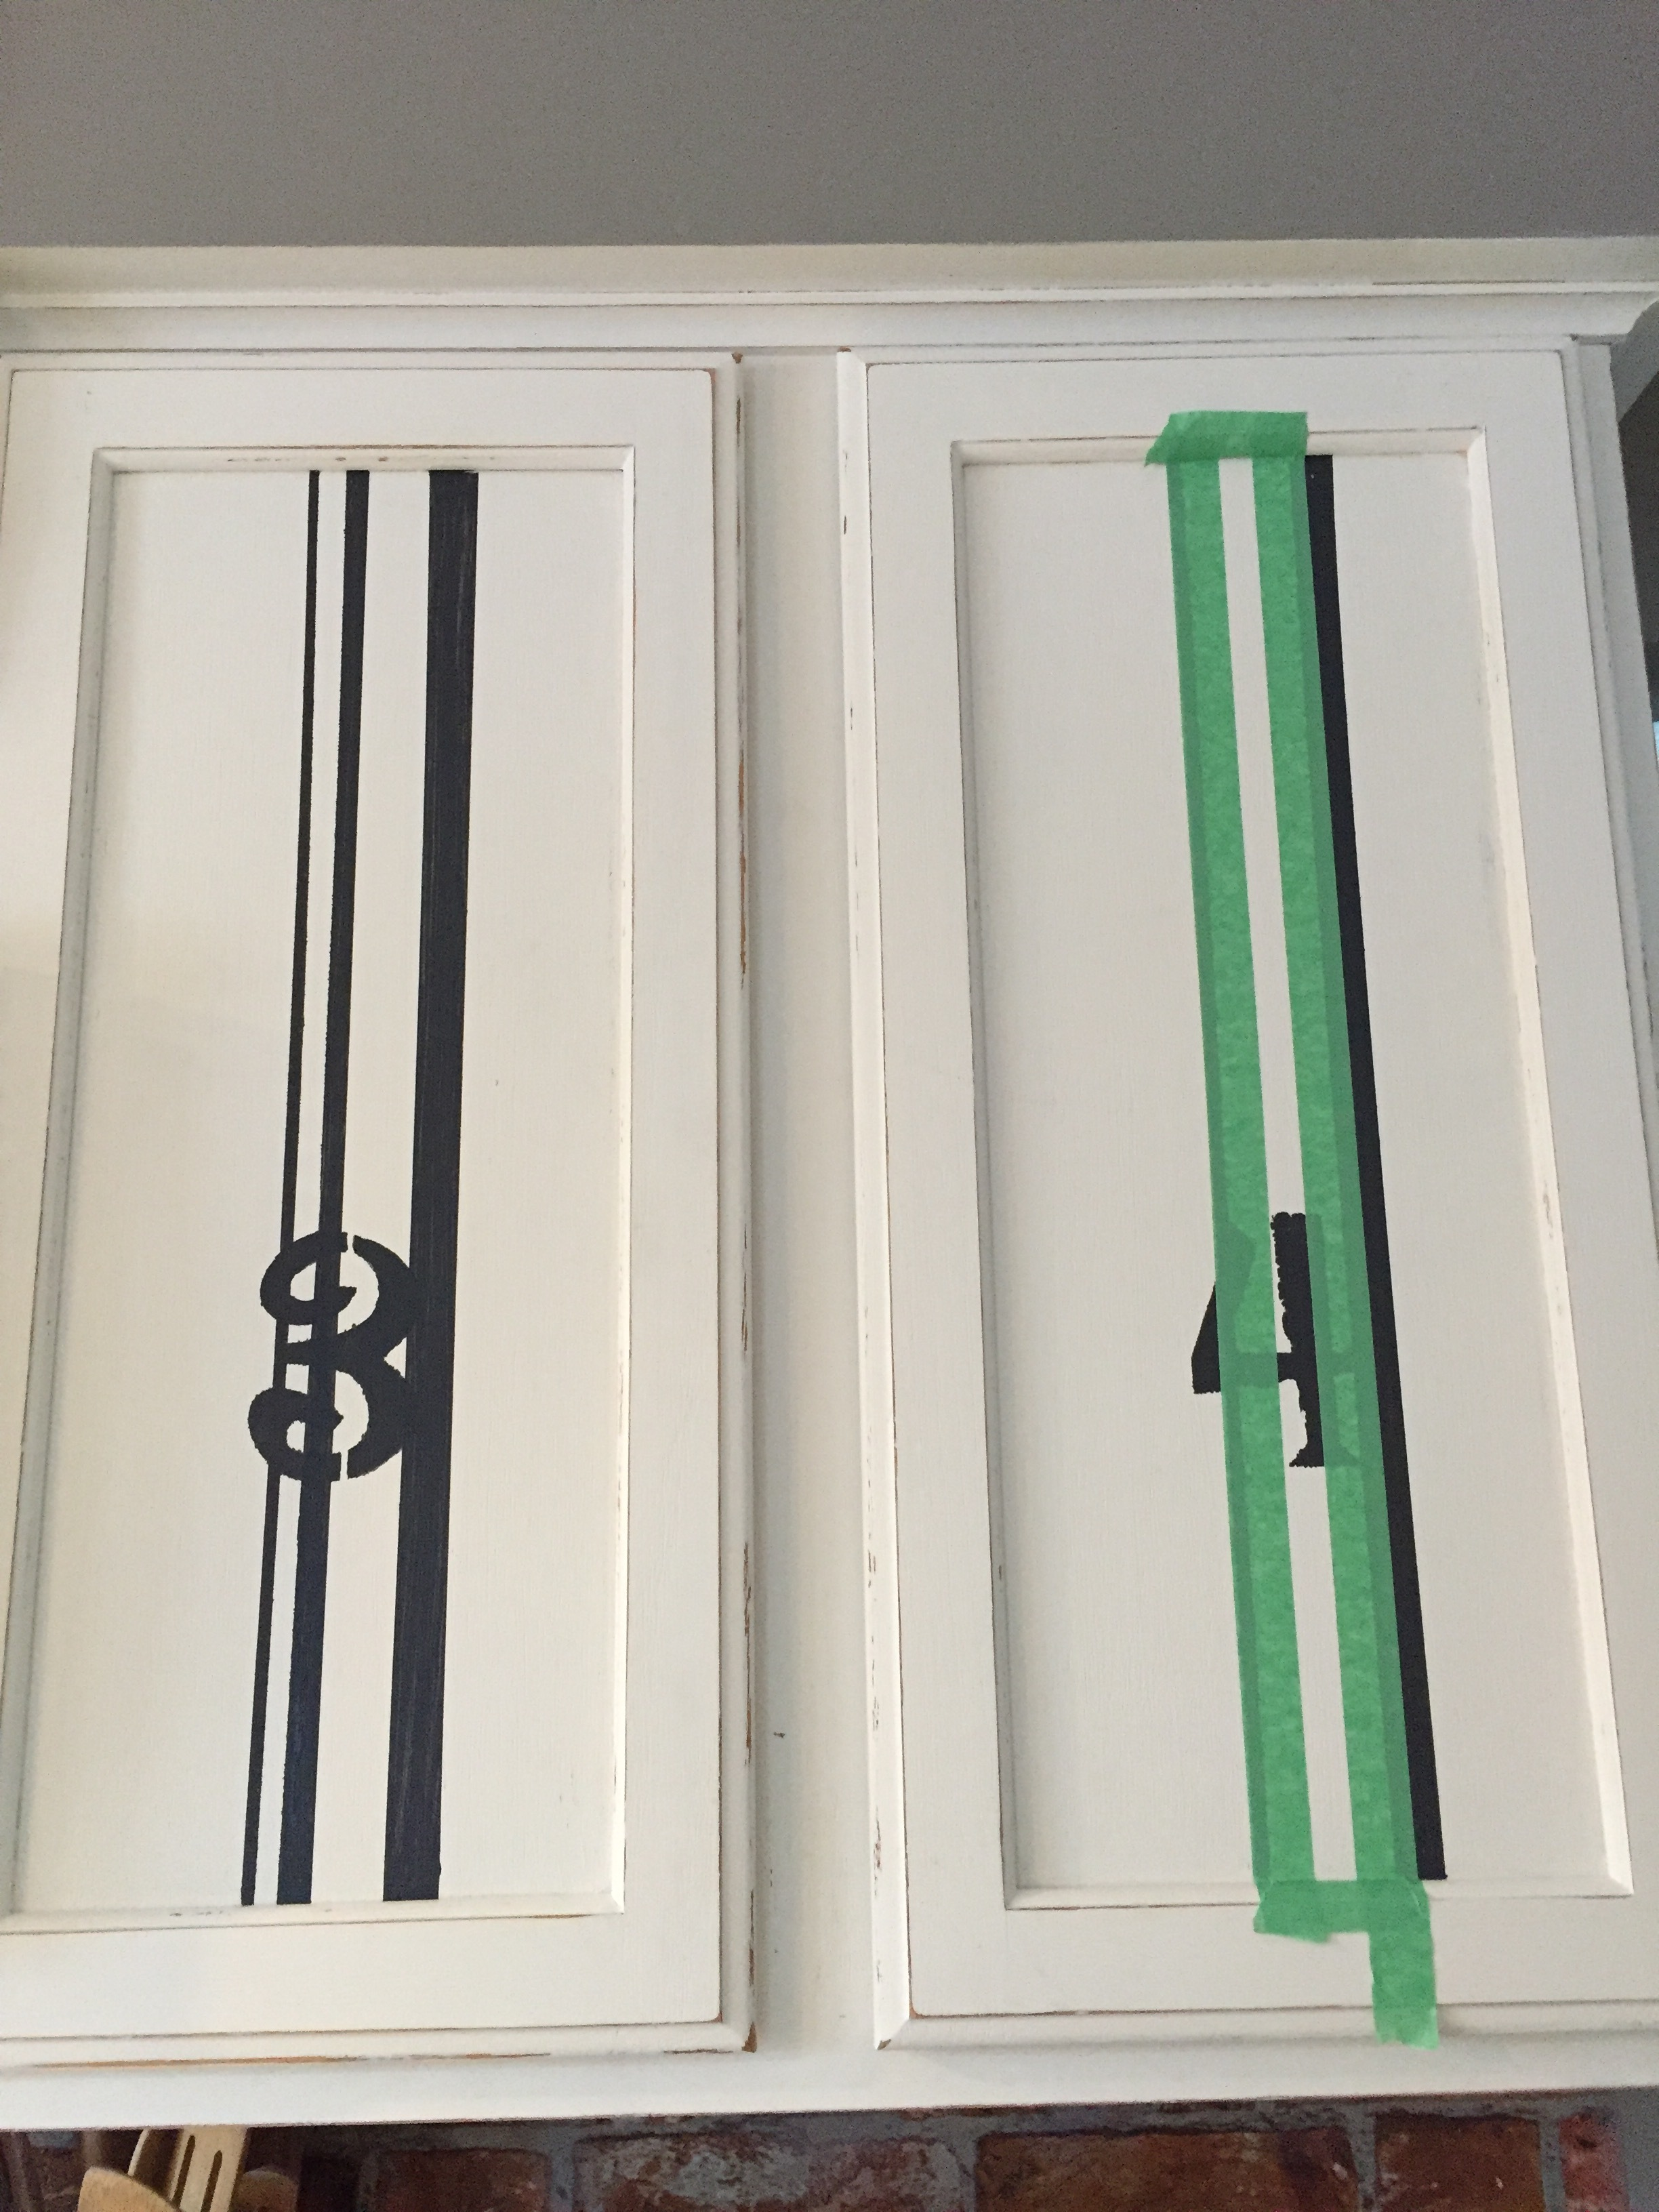 Adding grain sack stripes to cabinet door fronts